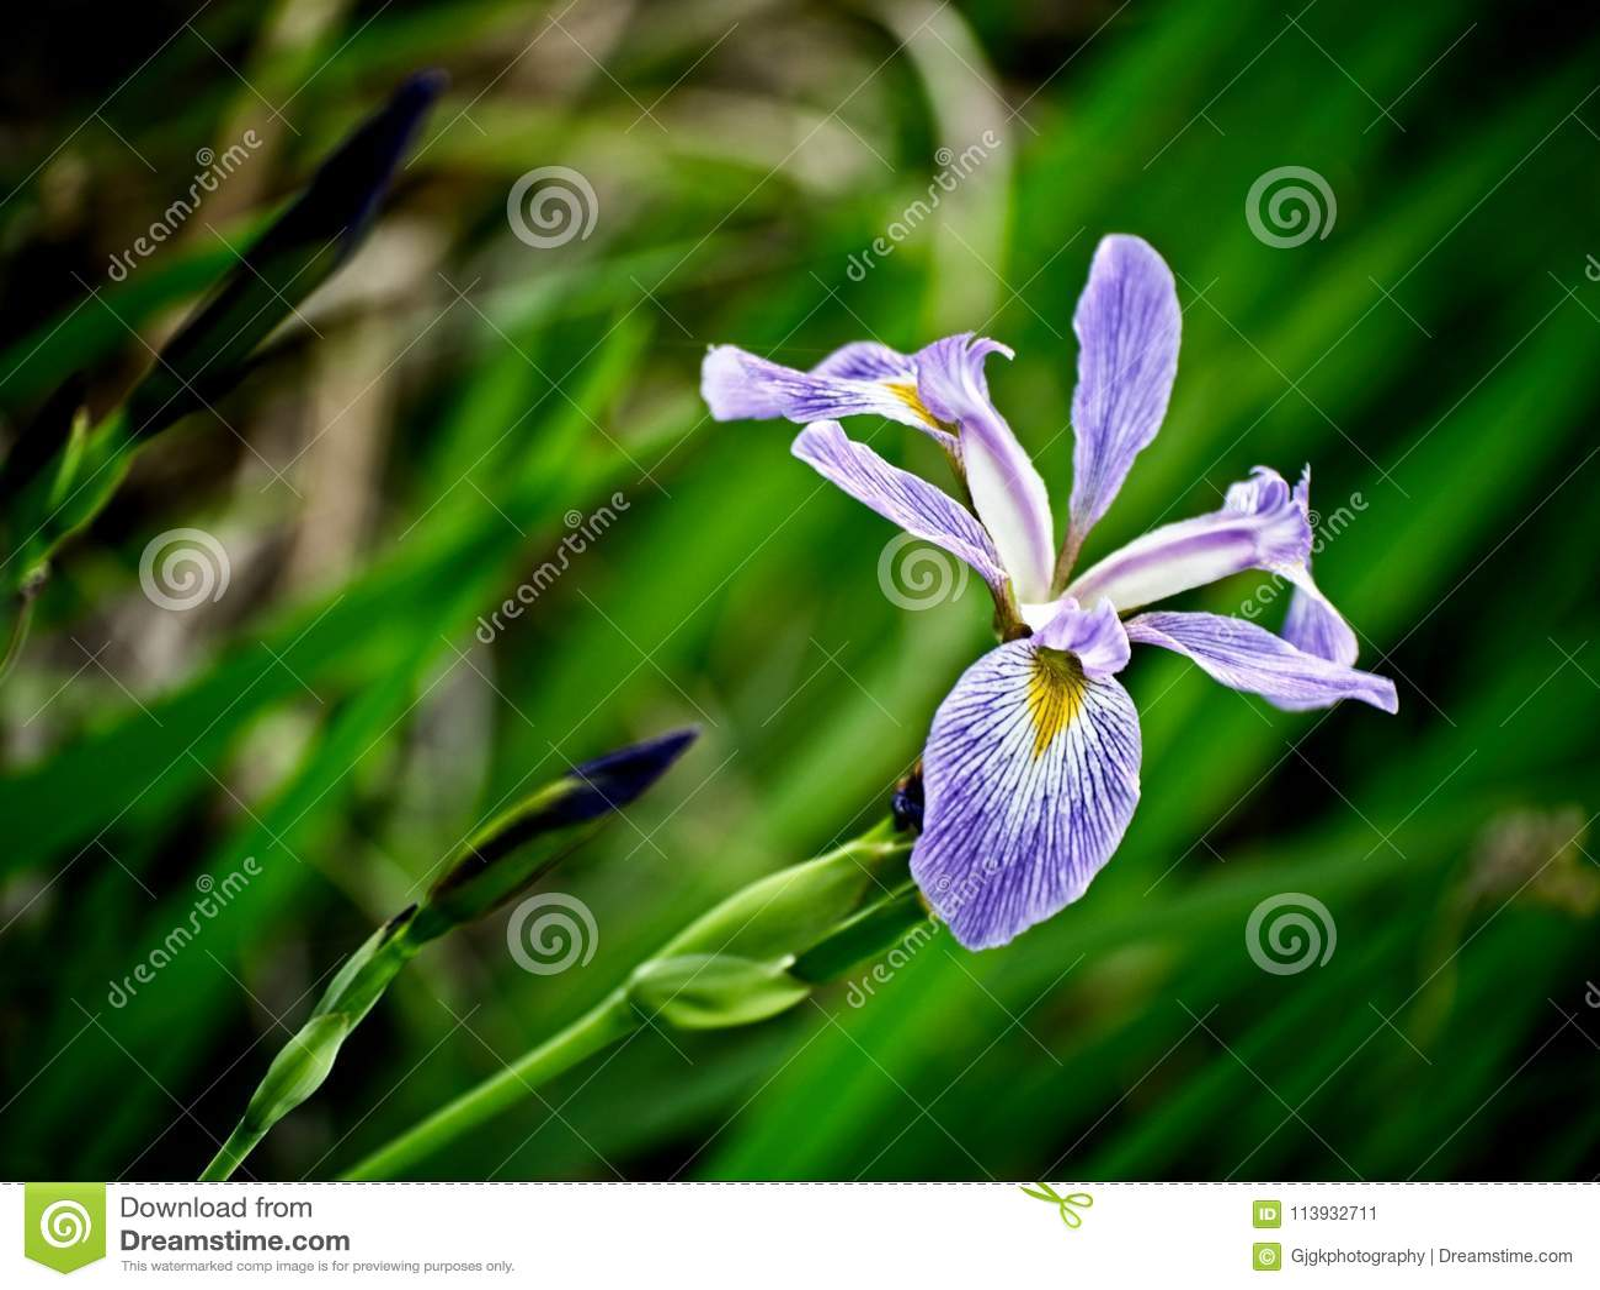 Iris in a Swamp Blooming 2